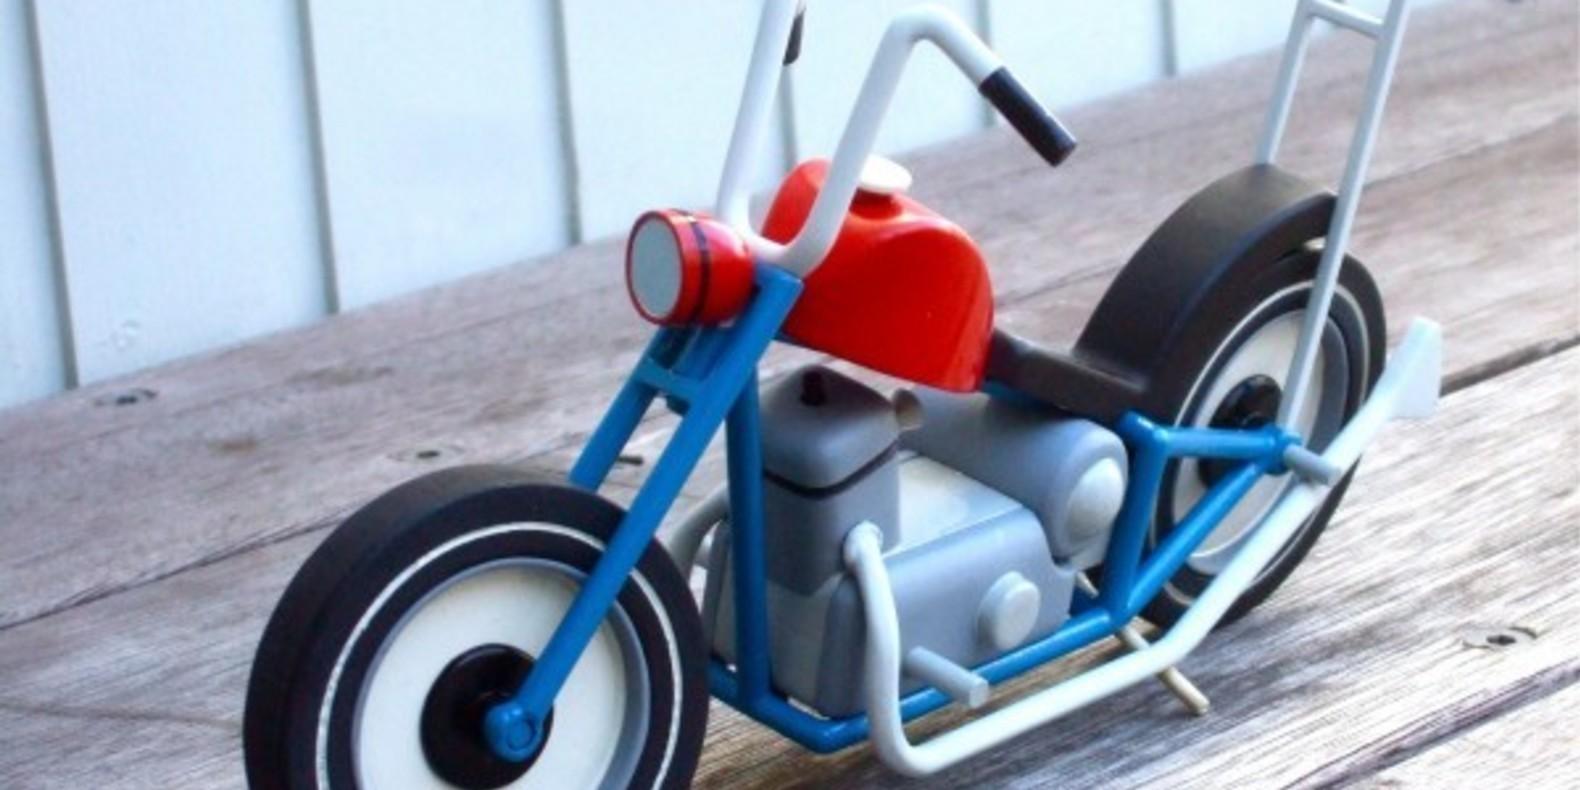 russell tate stay true motorcycle bike biker cults fichier 3D modèle 3D STL 3D printing 3